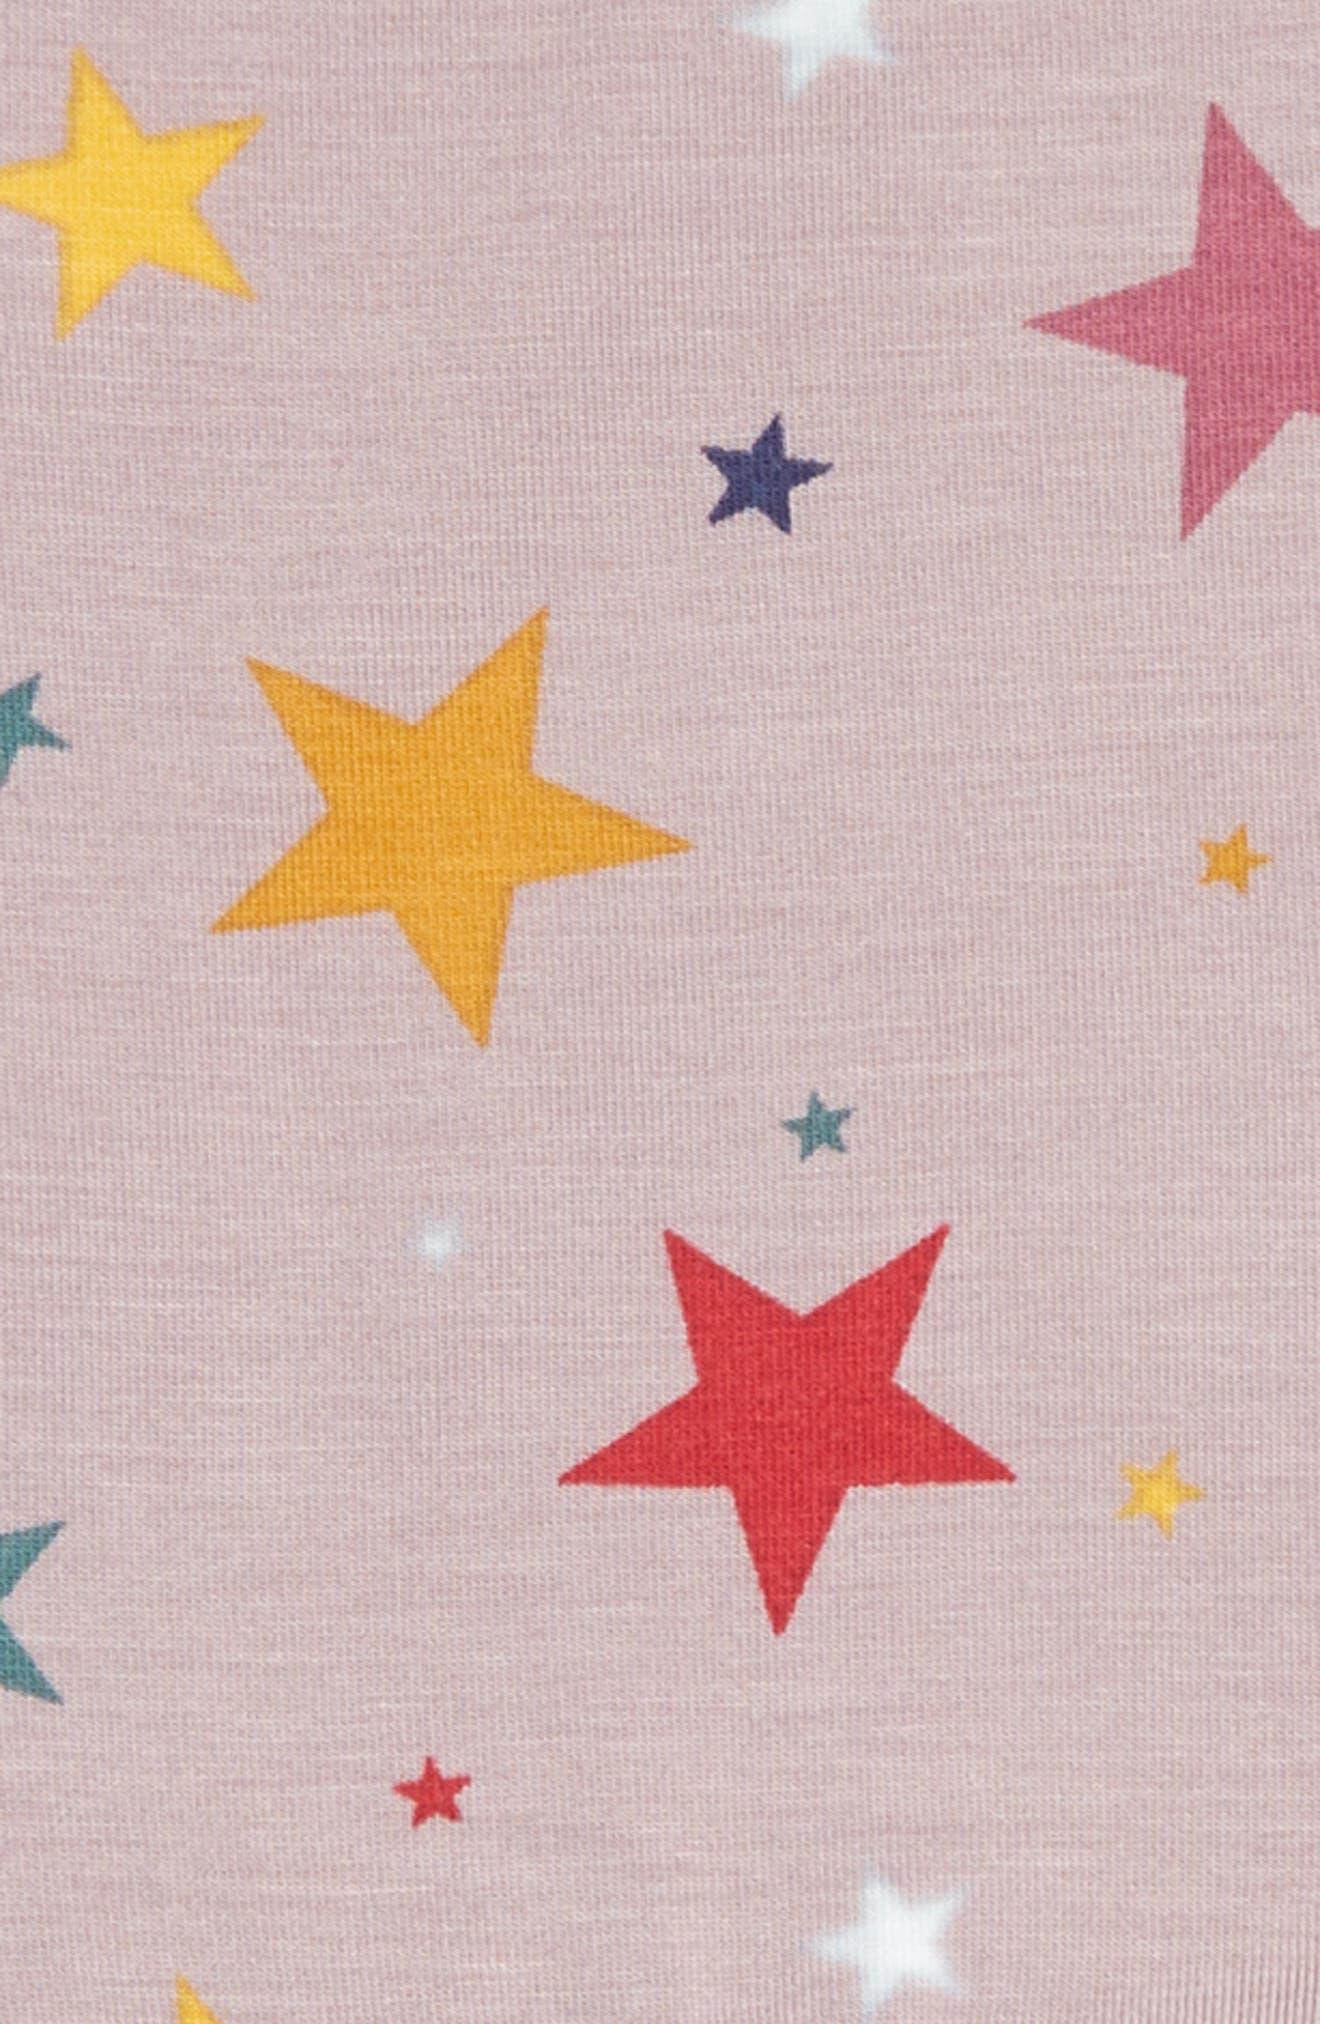 Candice Star Print Dress,                             Alternate thumbnail 3, color,                             513